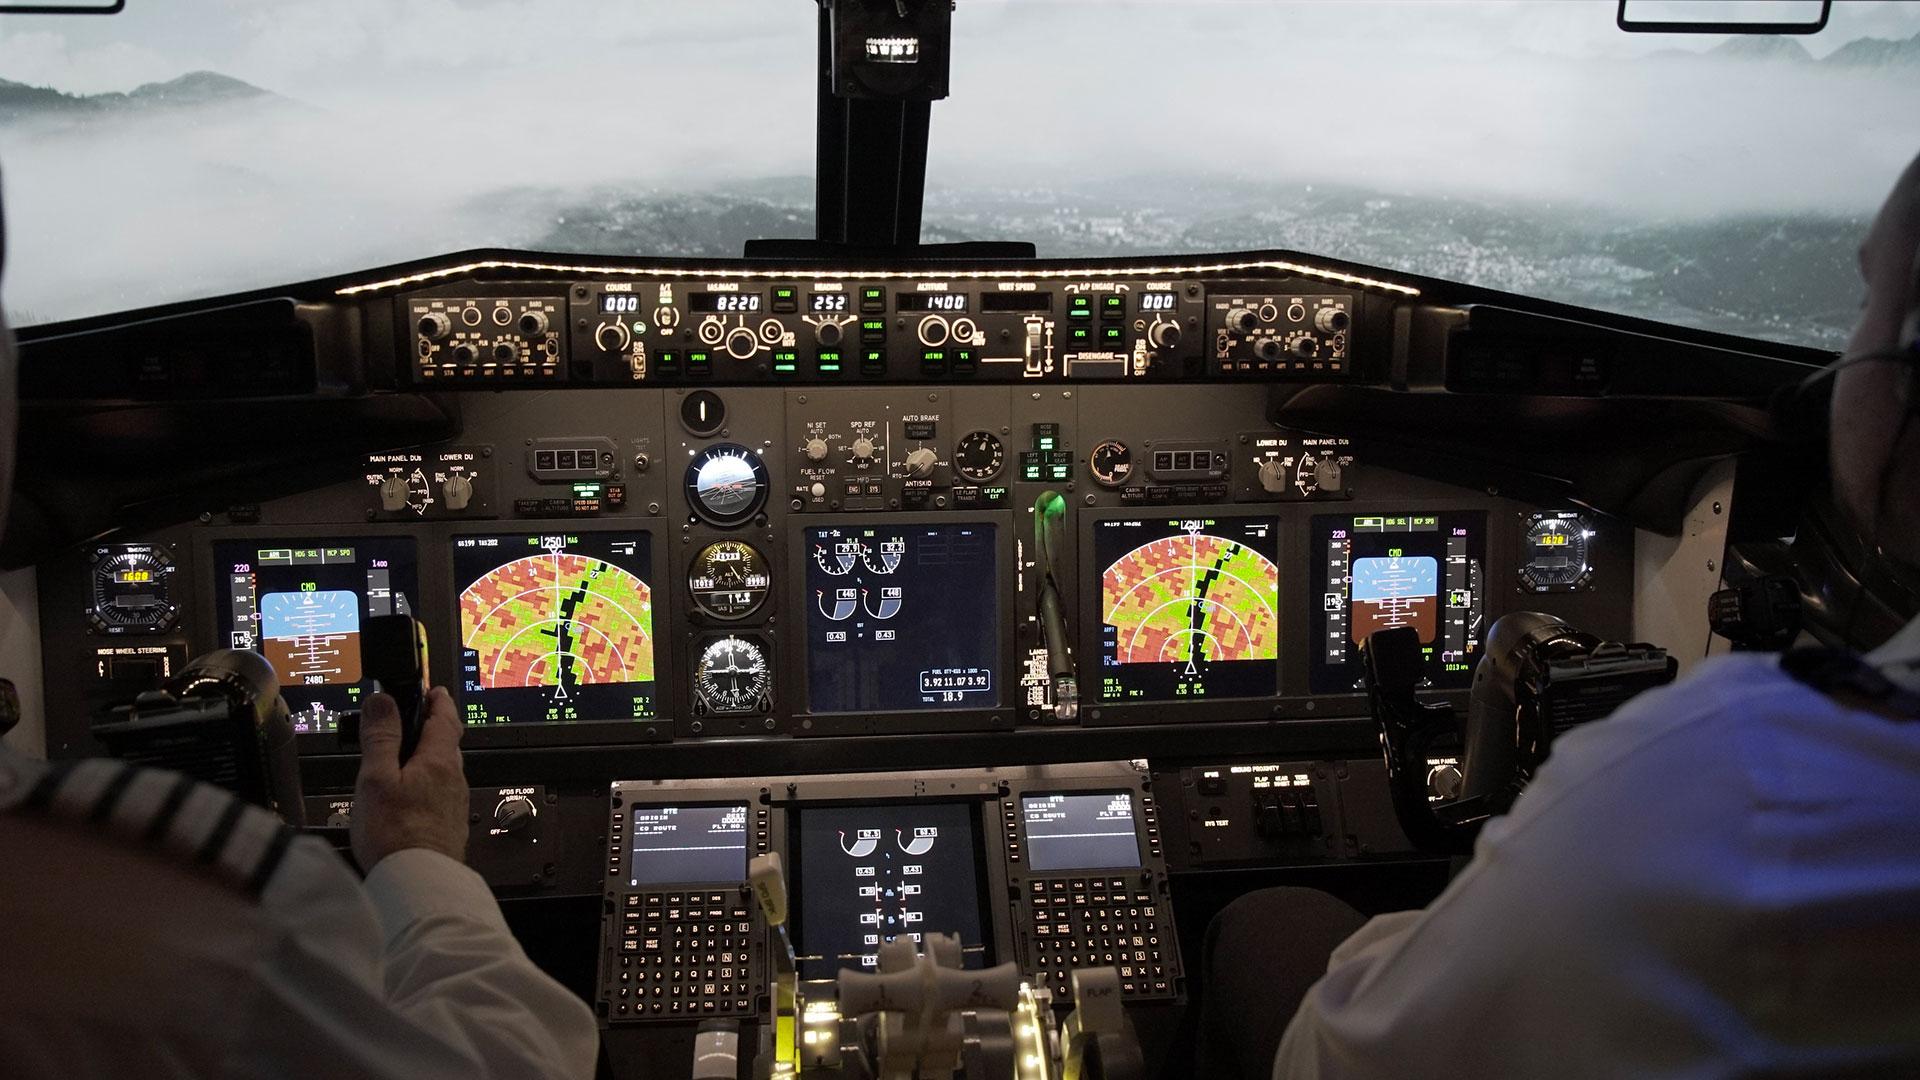 NEW 737 FLIGHT SIMULATOR COMING SOON TO BLACKPOOL AIRPORT